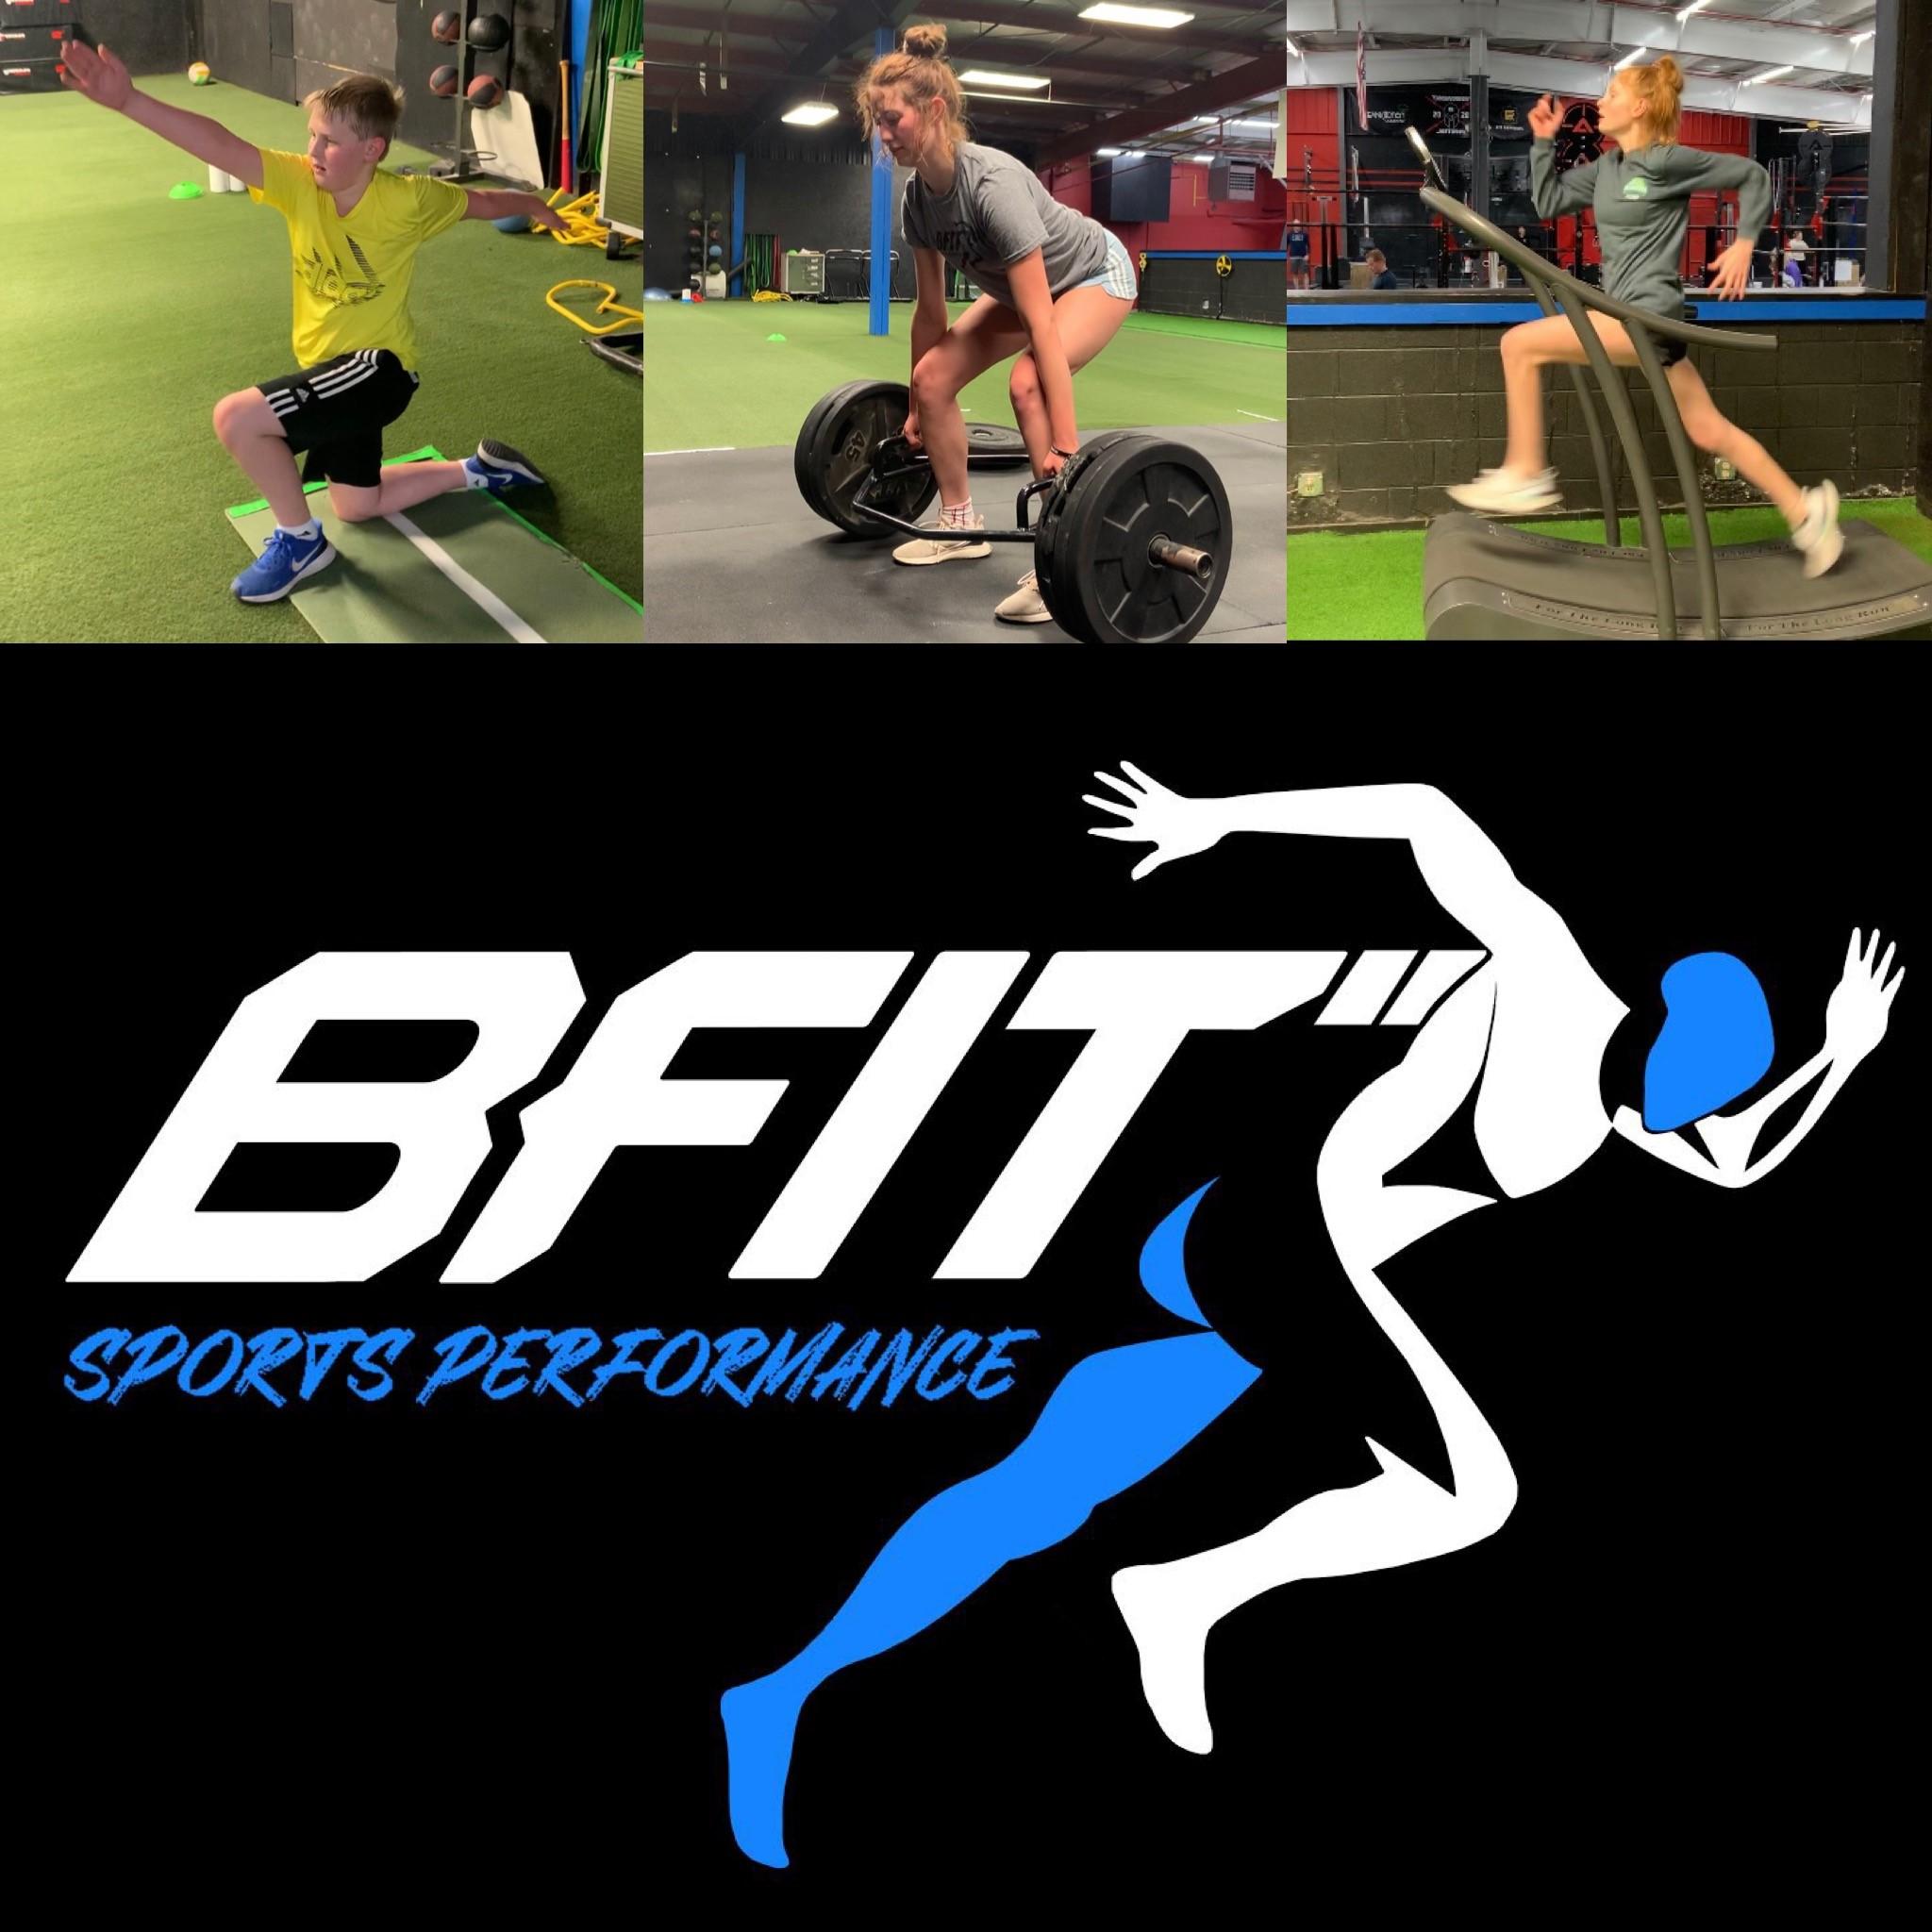 BFIT sports performance